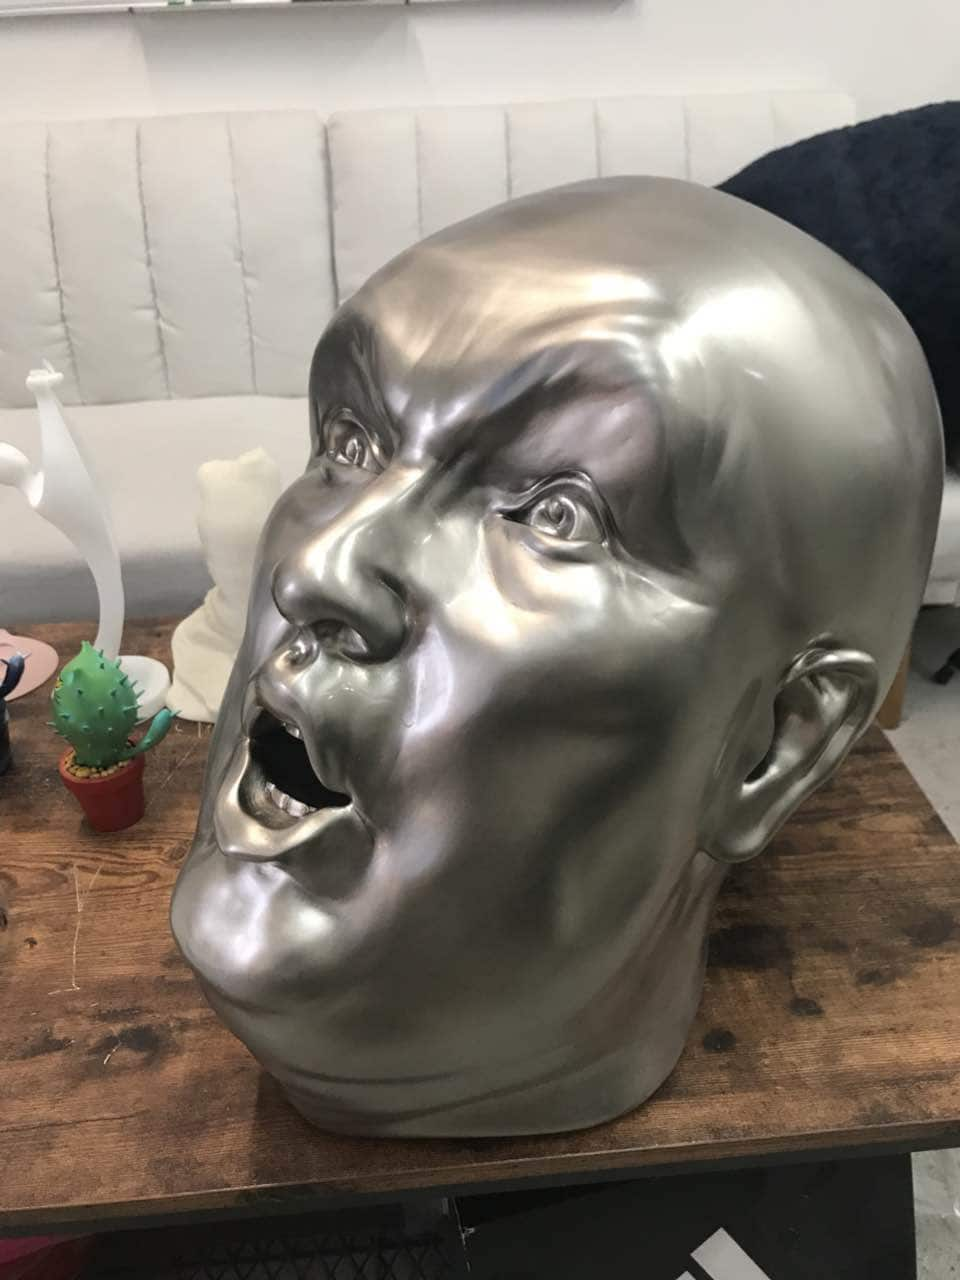 Metal plated Donald Trump head